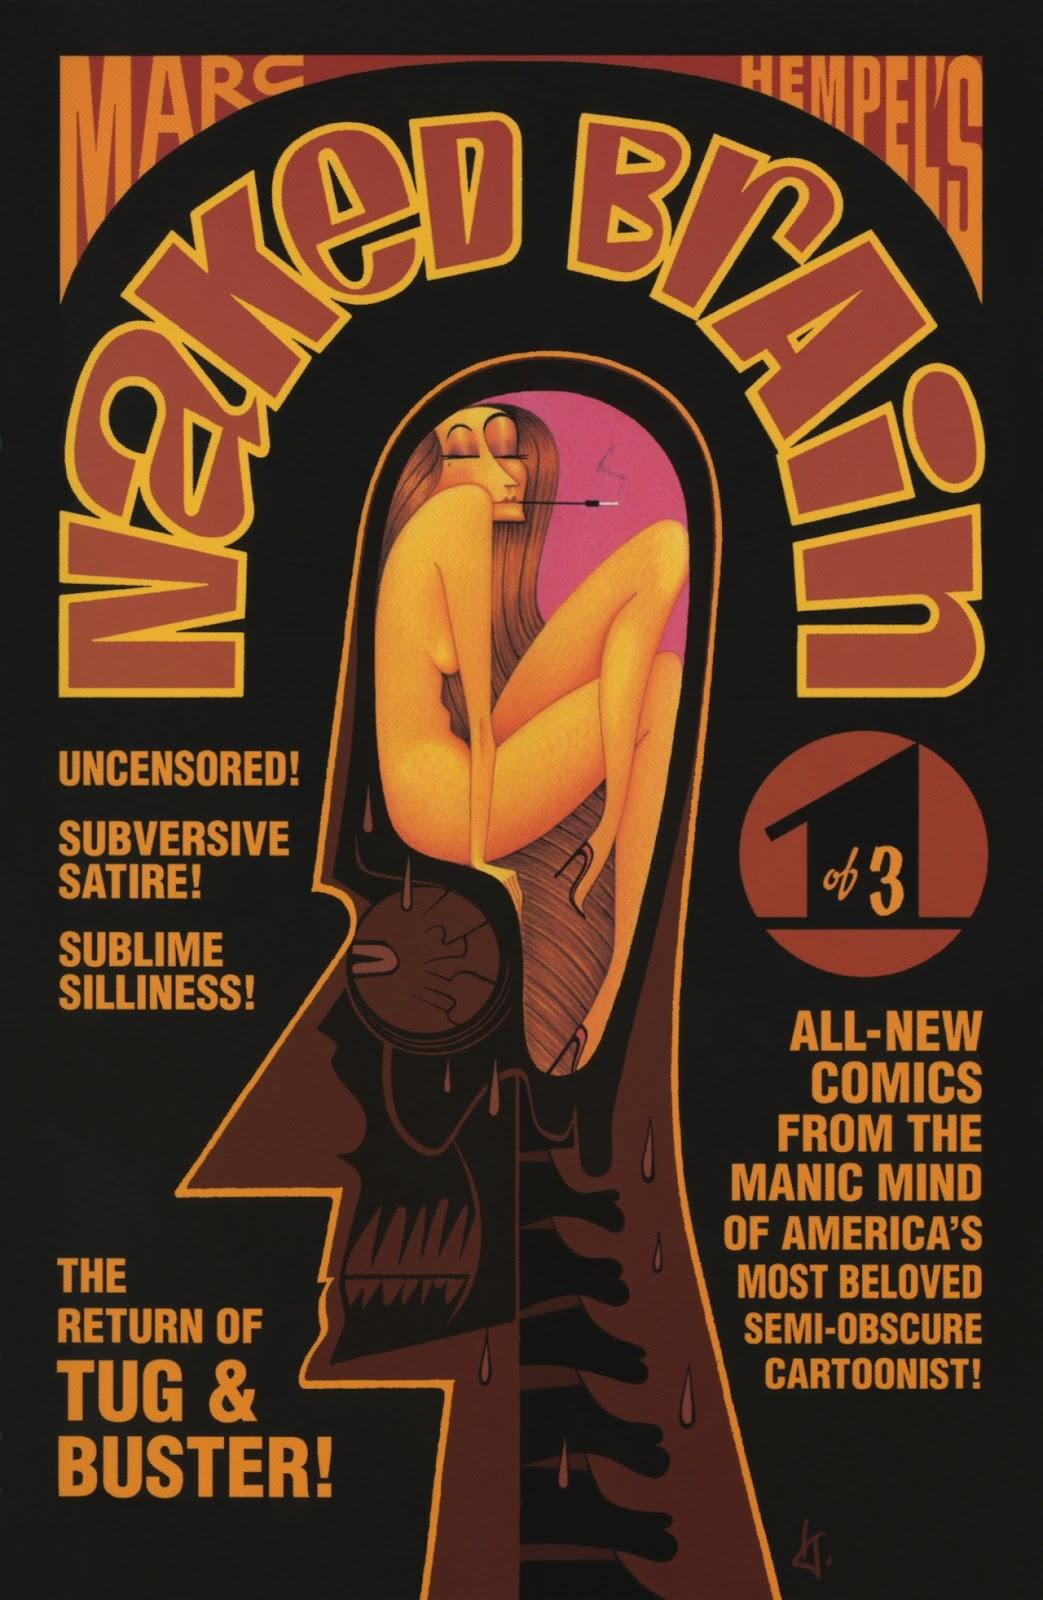 Marc Hempels Naked Brain 1 Page 1